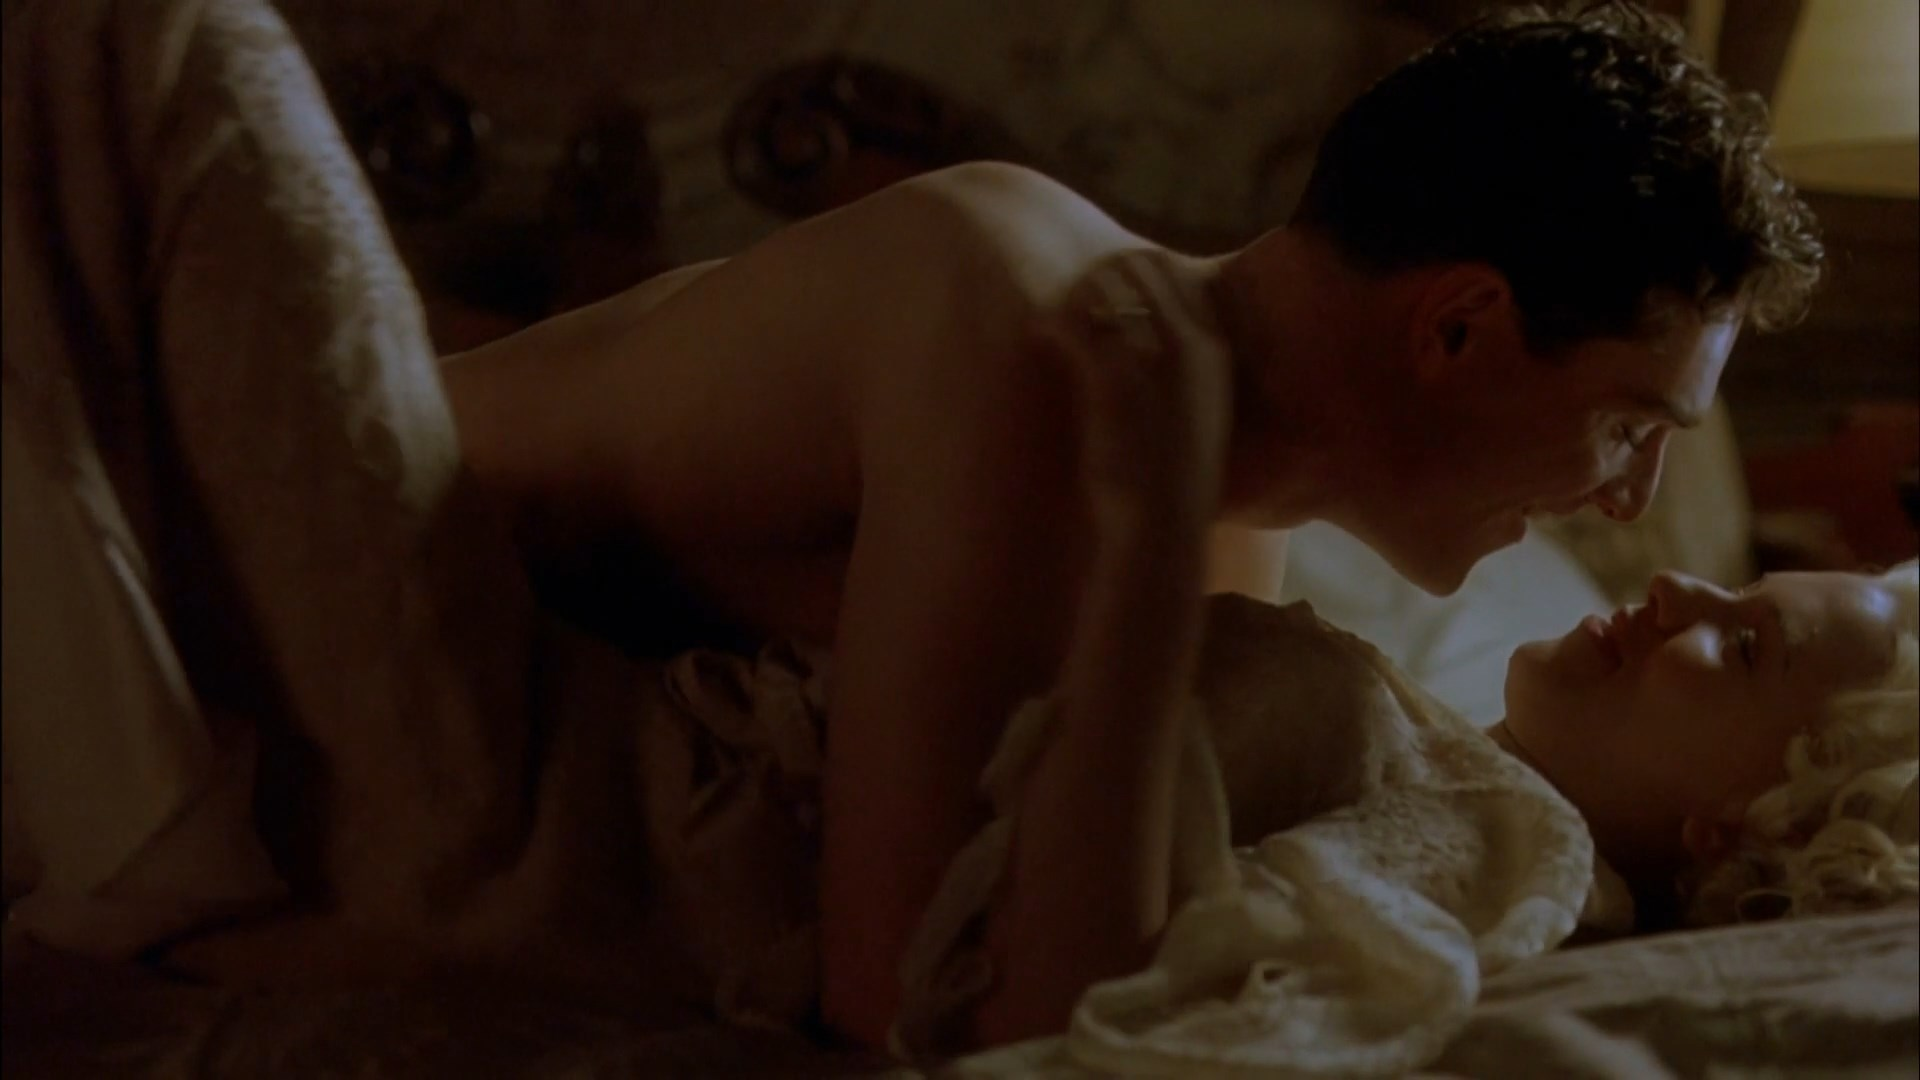 scarlett johansson a good woman naked